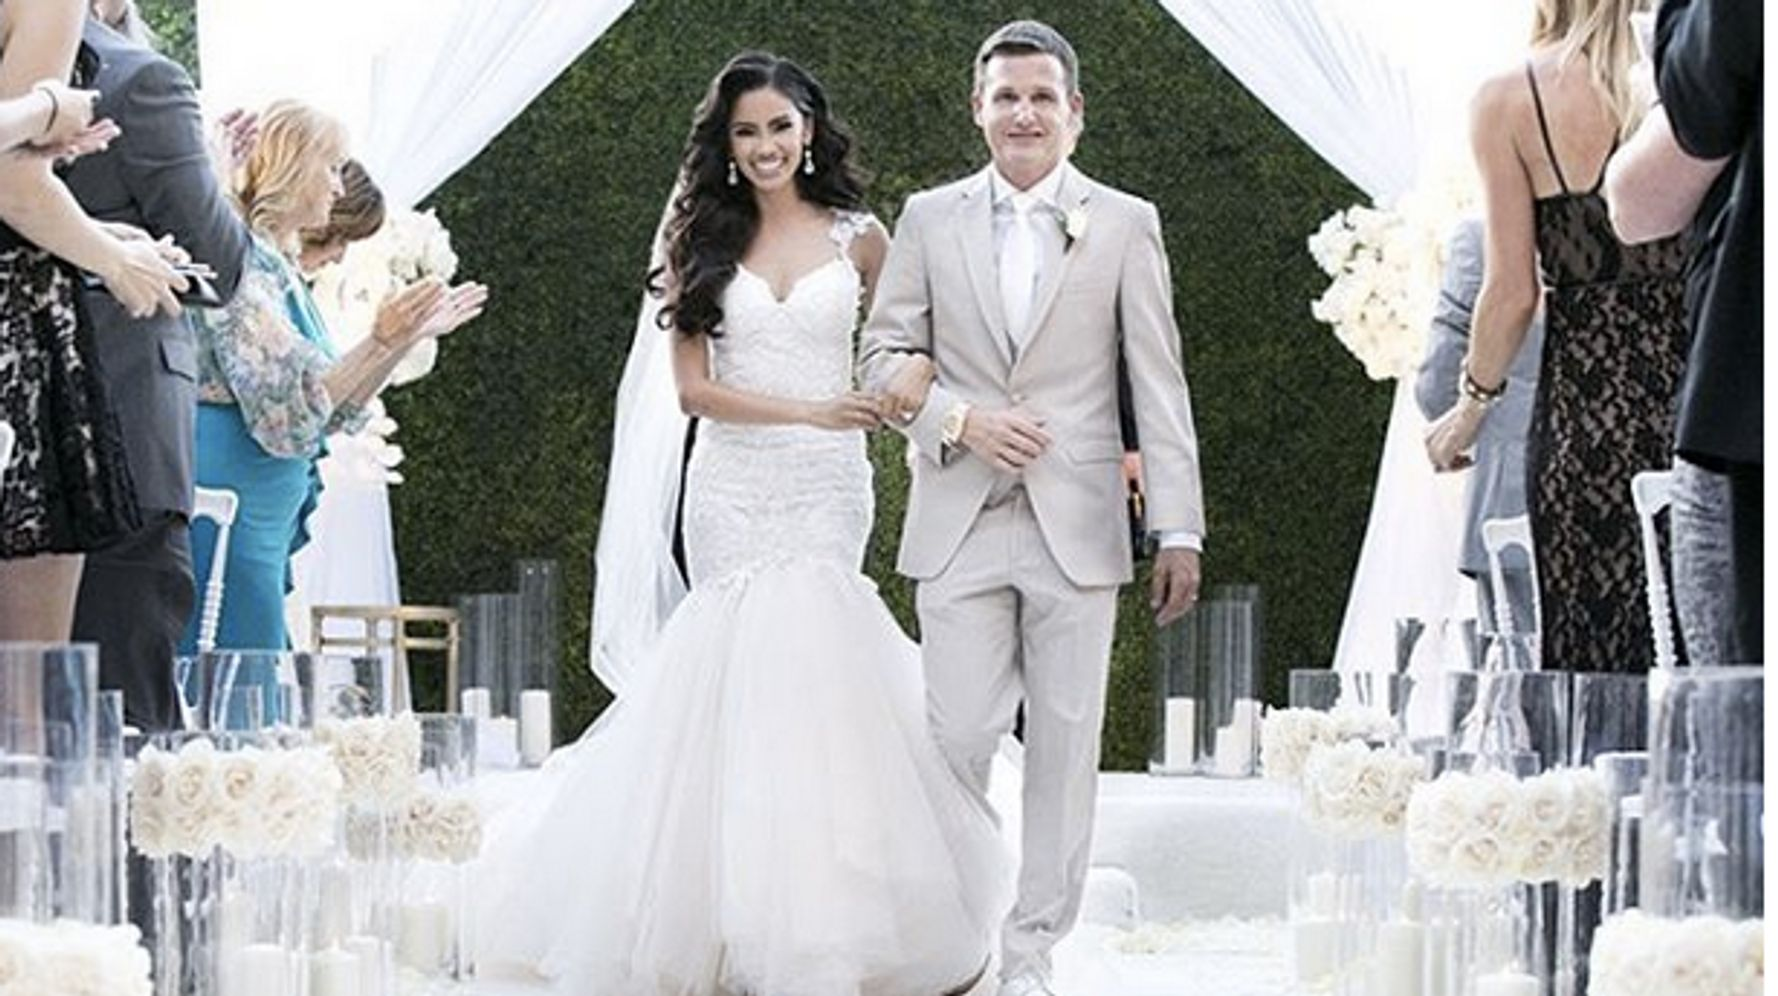 is rob dyrdek married